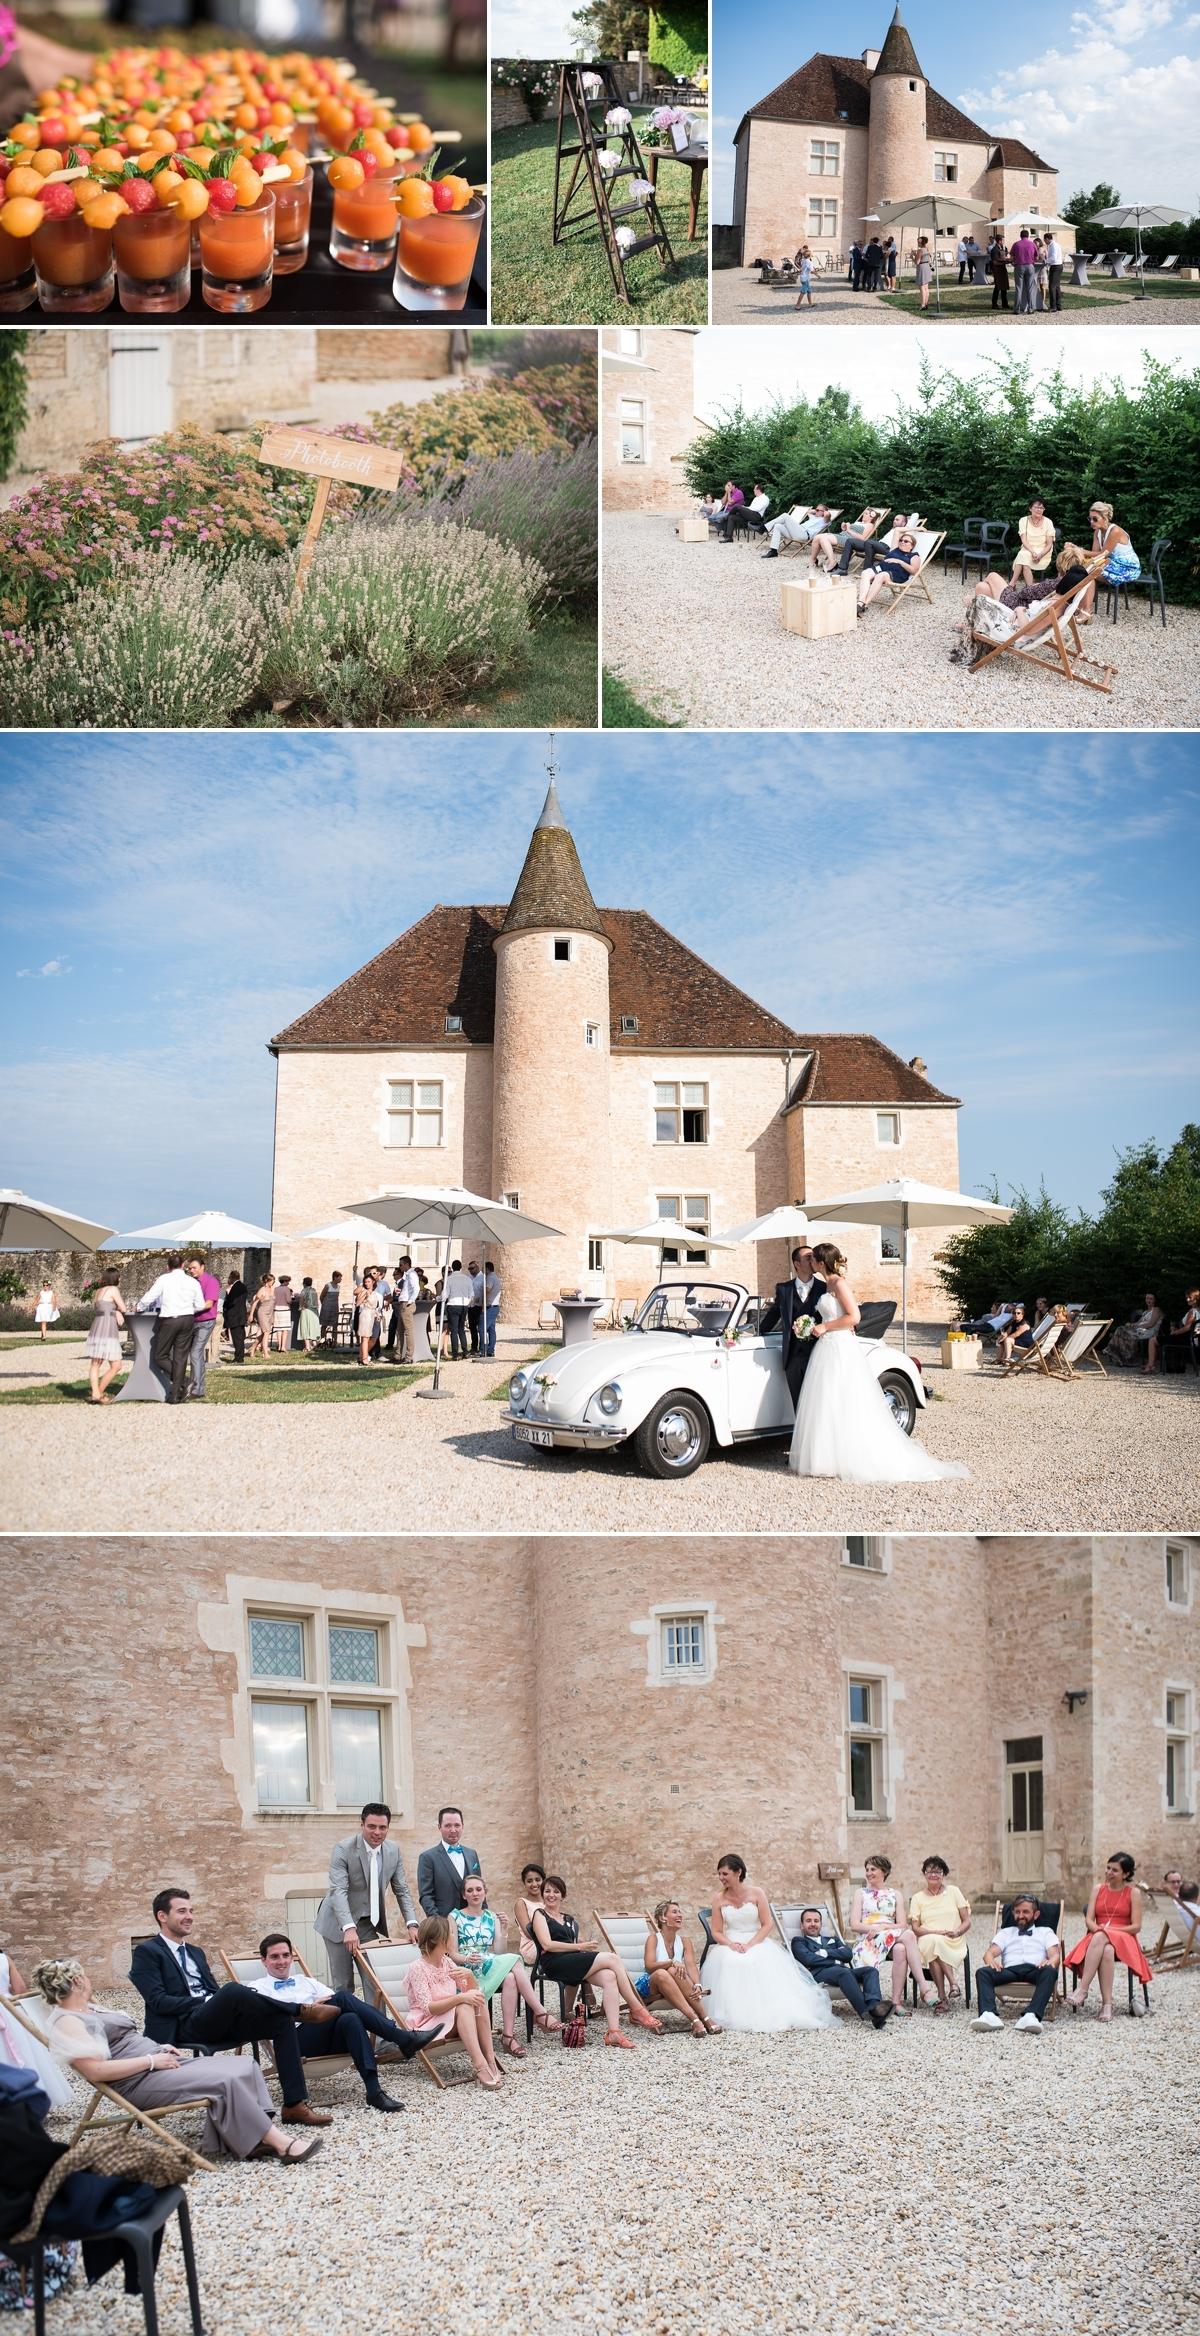 vin-honneur-mariage-manoir-equivocal-claudine-nicolas